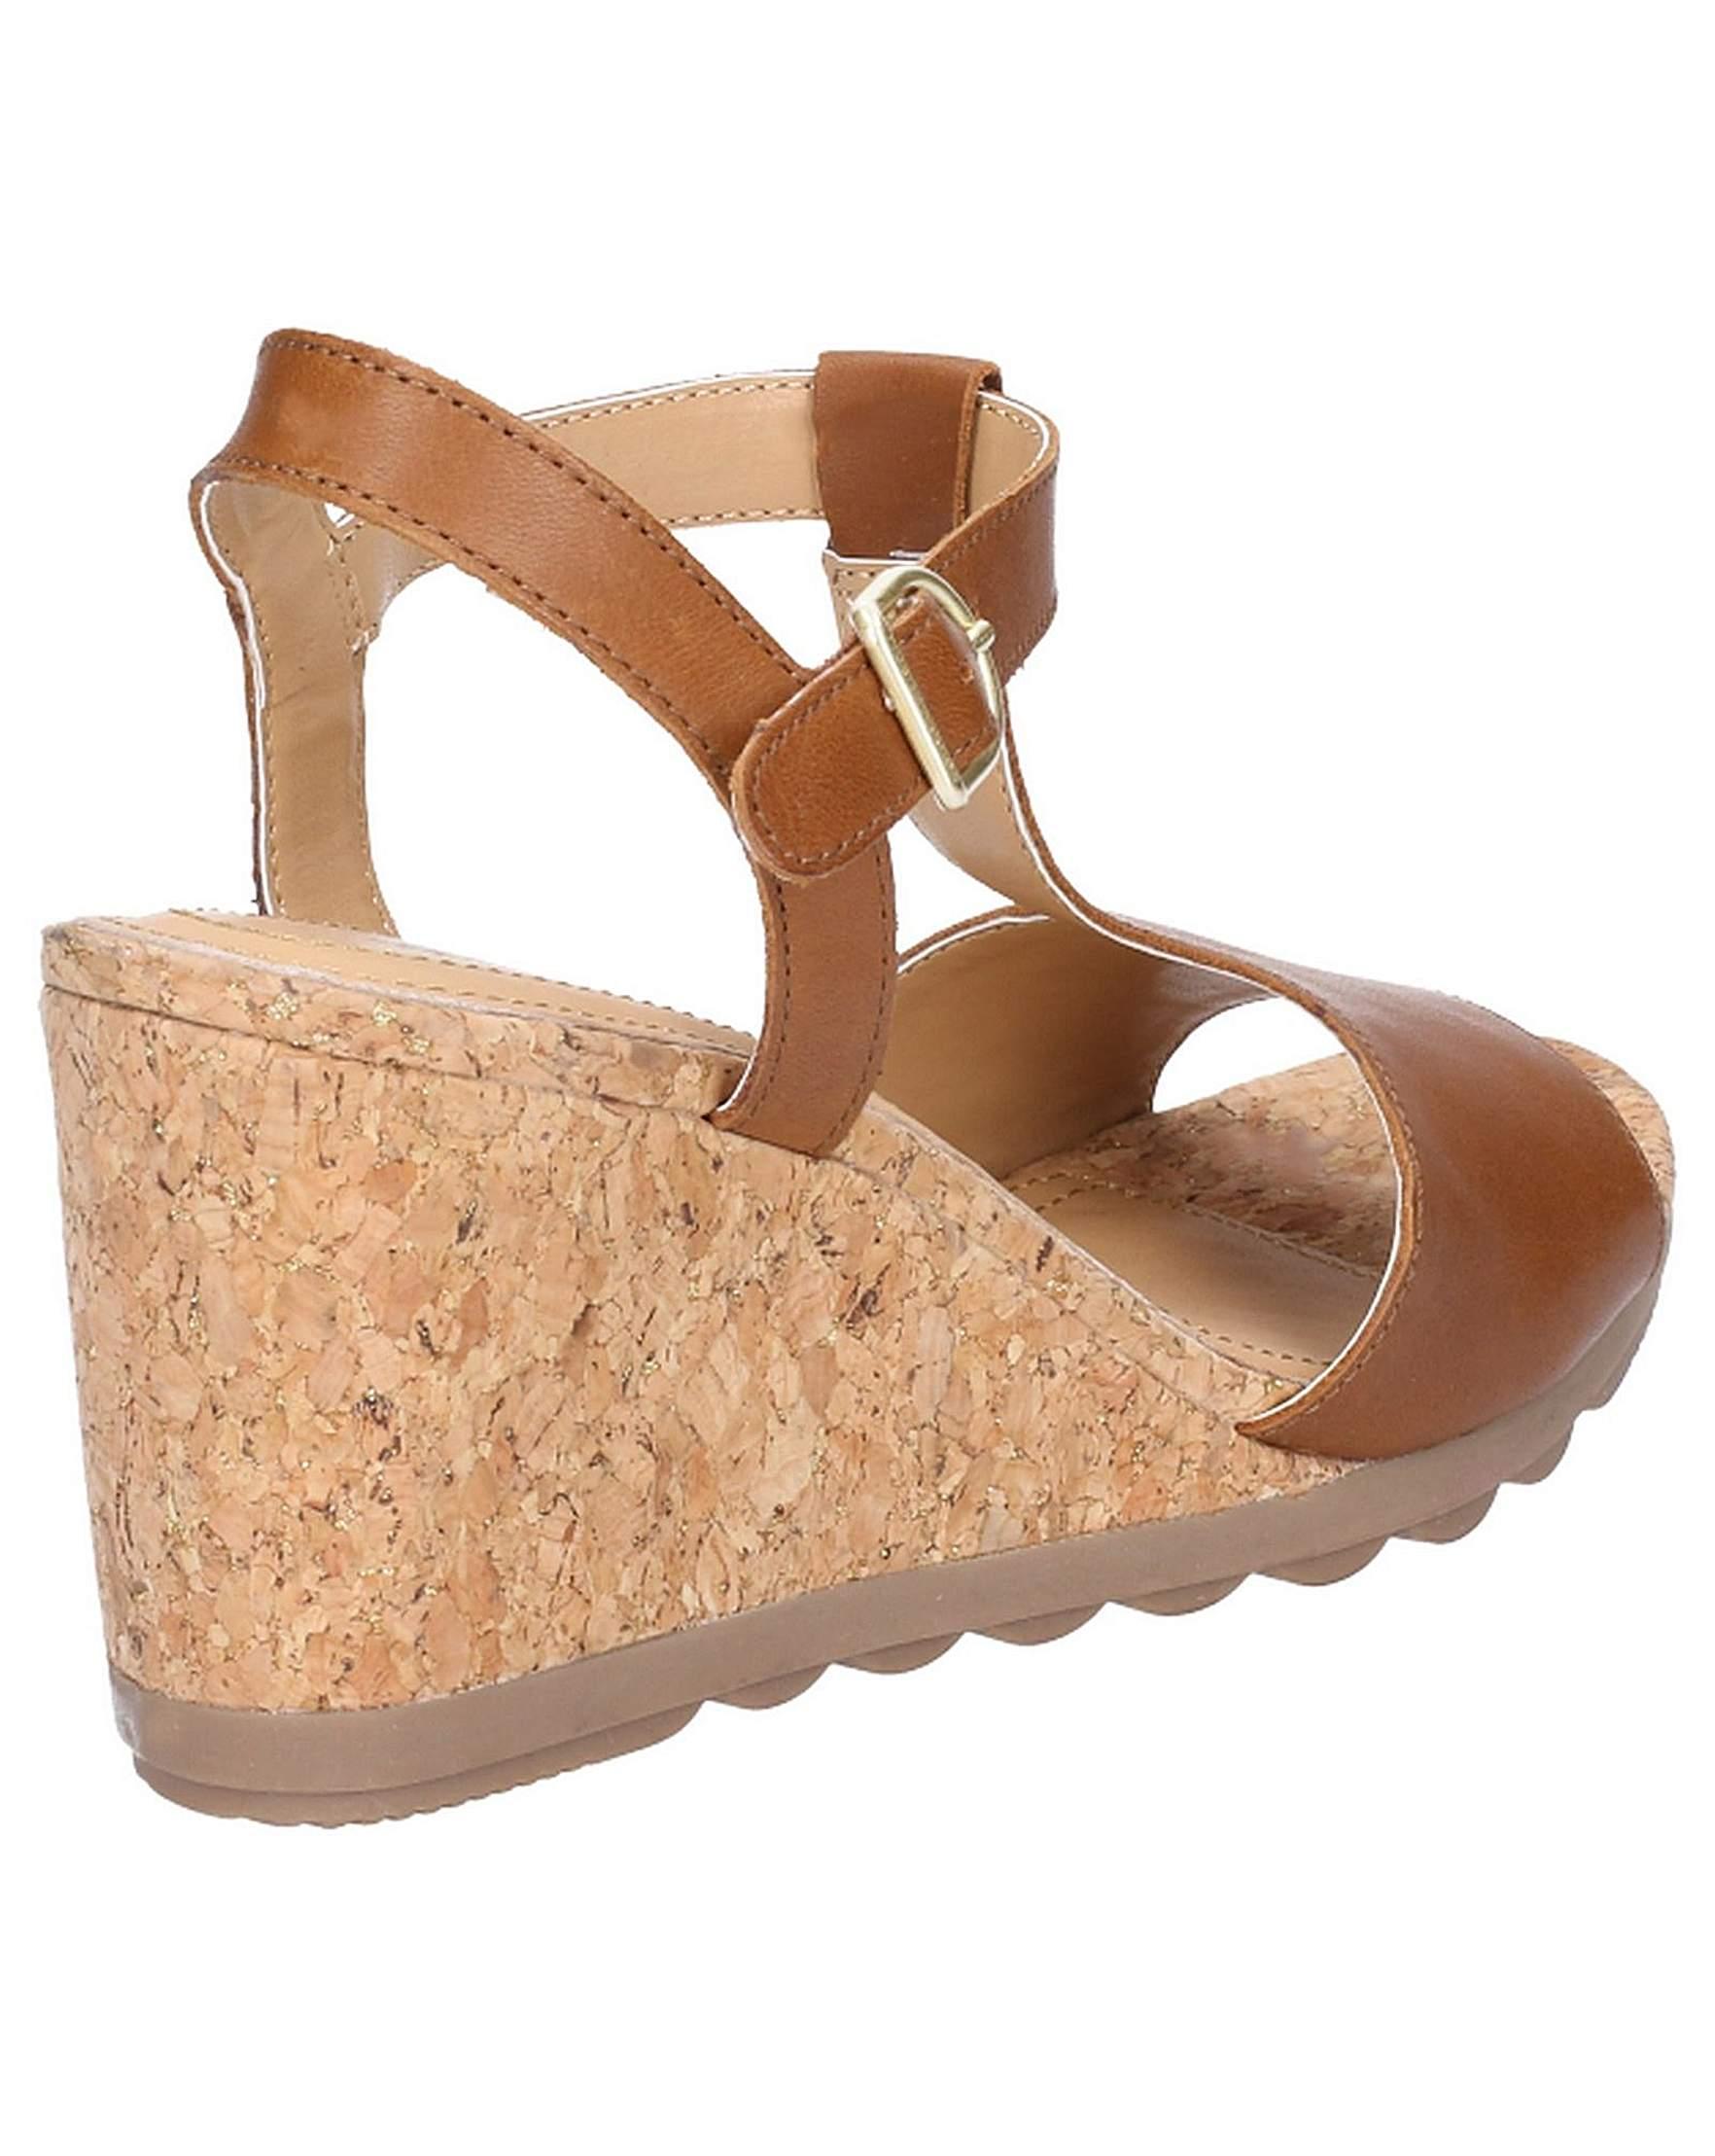 816c4df57022f Hush Puppies Pekingese Tstrap Sandal | Simply Be